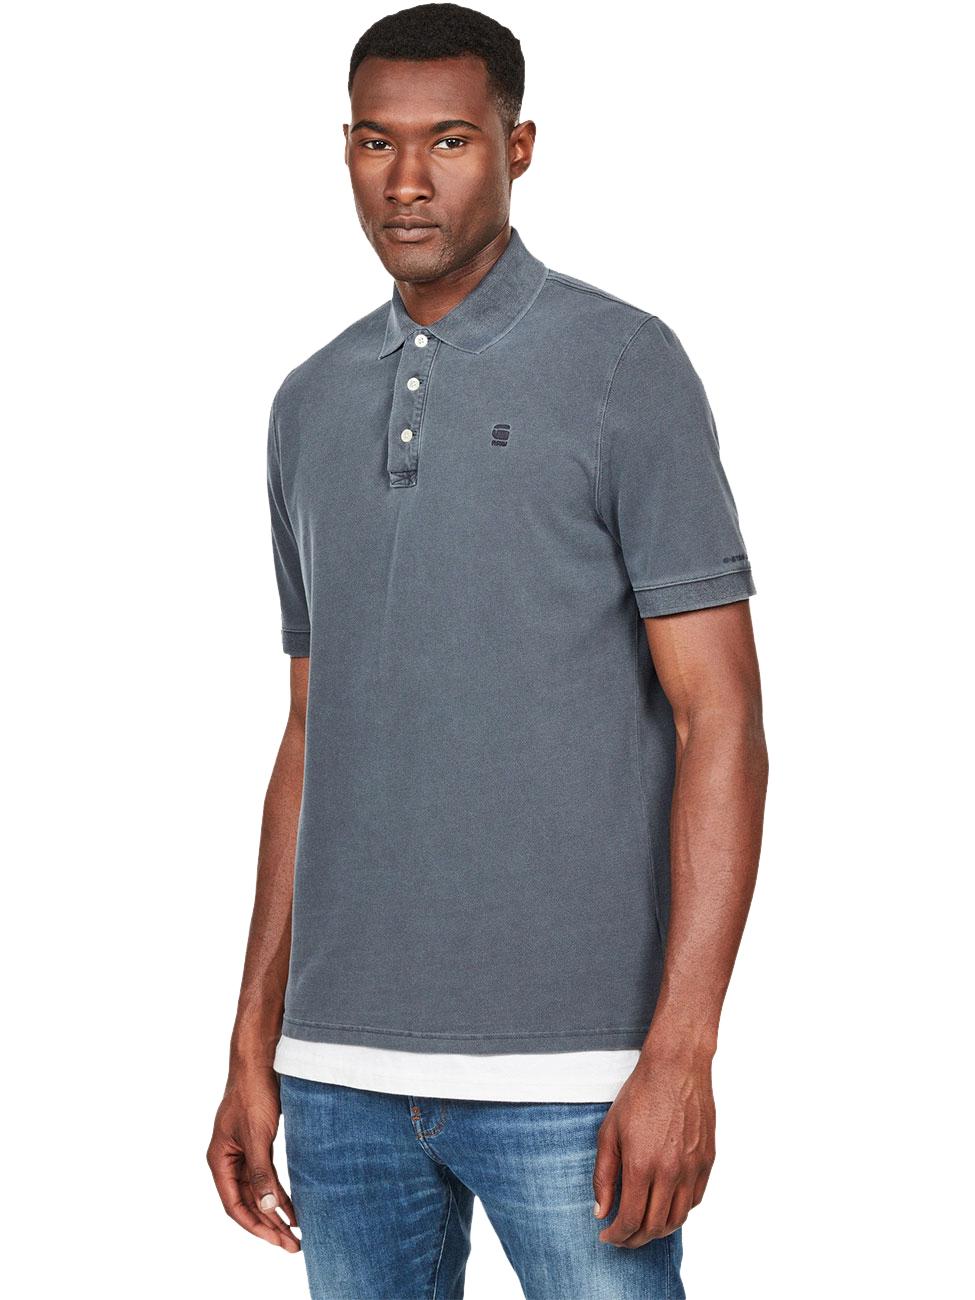 G-Star Herren Kurzarm Poloshirt Halite - Straight Fit